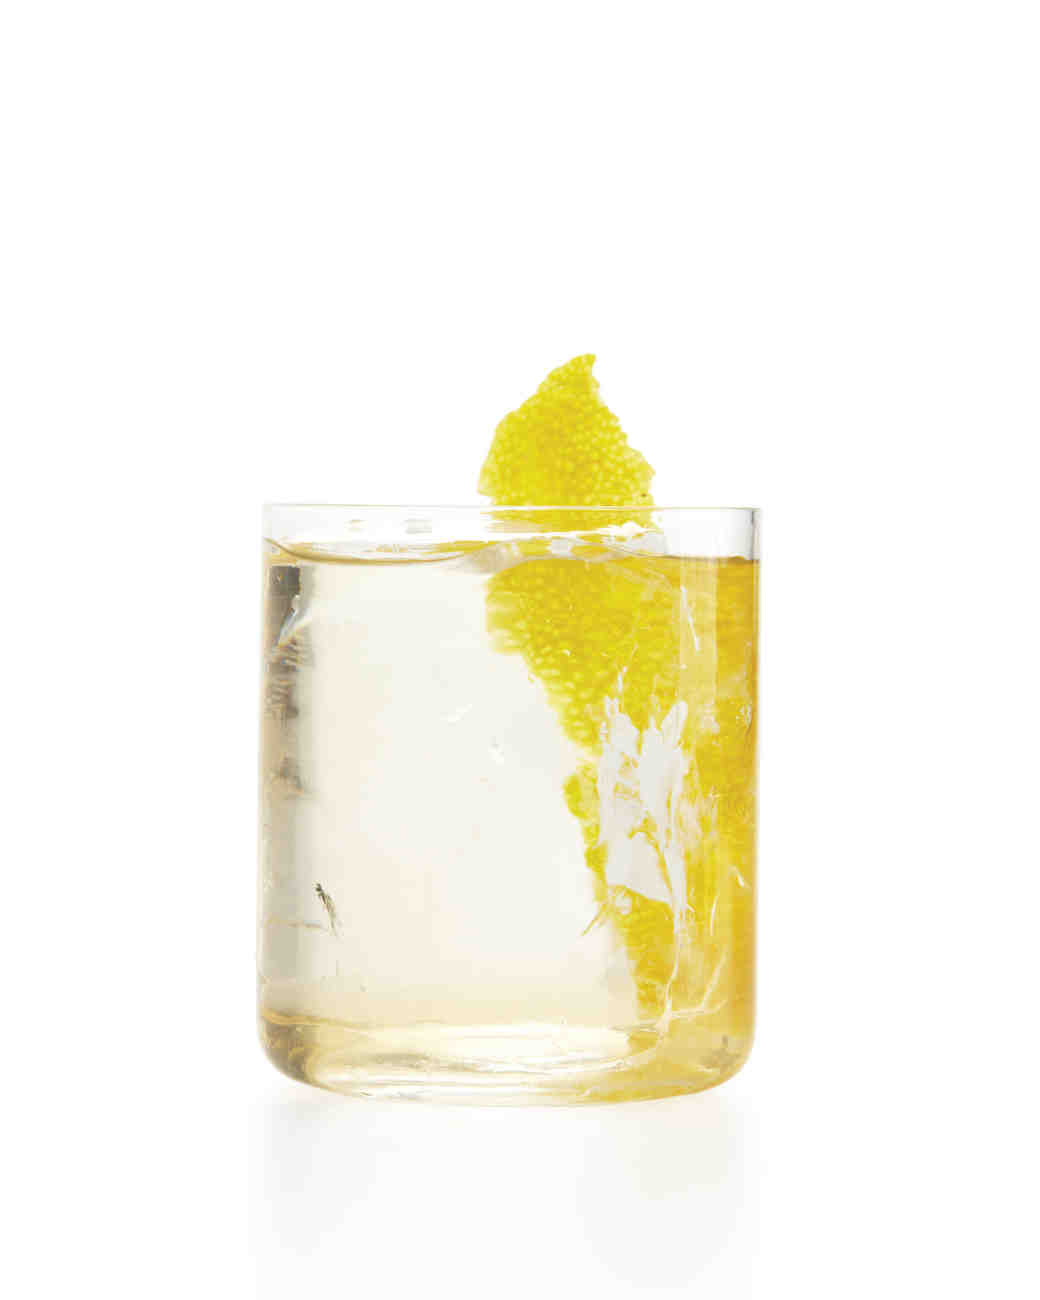 cocktailb02-sum11mwd107159.jpg